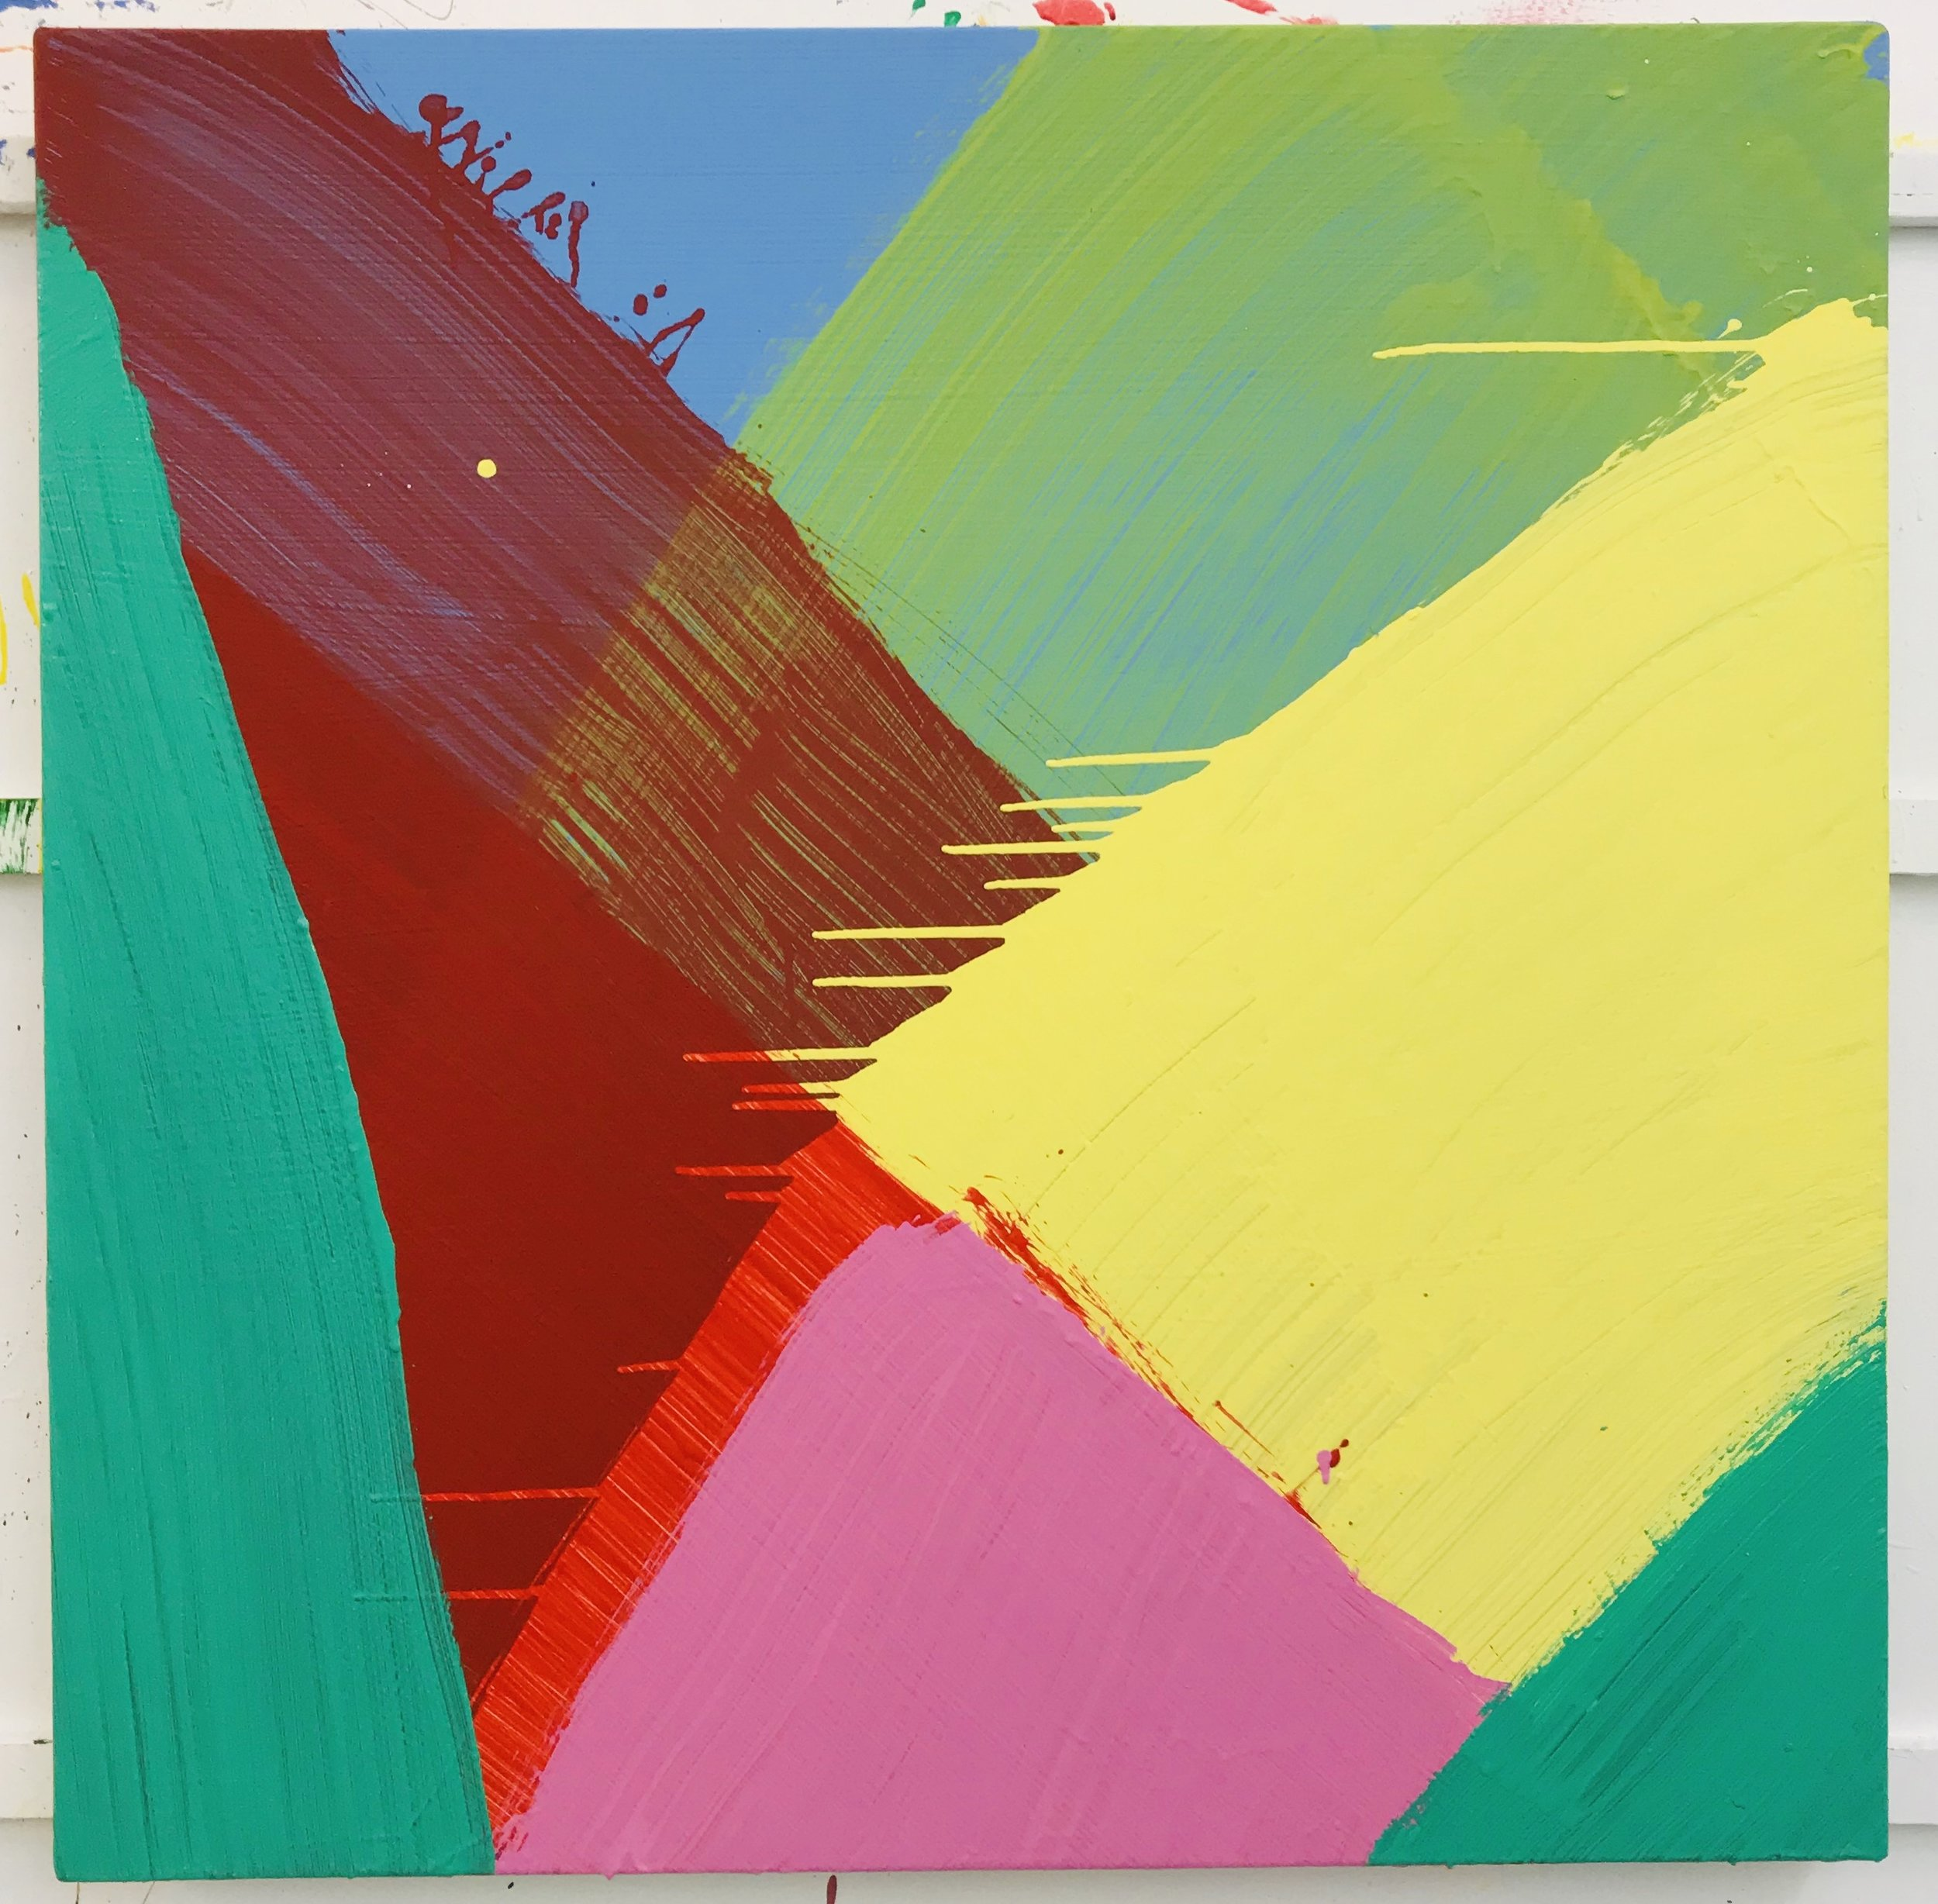 Hartford Art School Galleries_Cat Balco_Open Blue #1_2019 Acrylic on canvas_36%22x36%22_$4,500.jpg